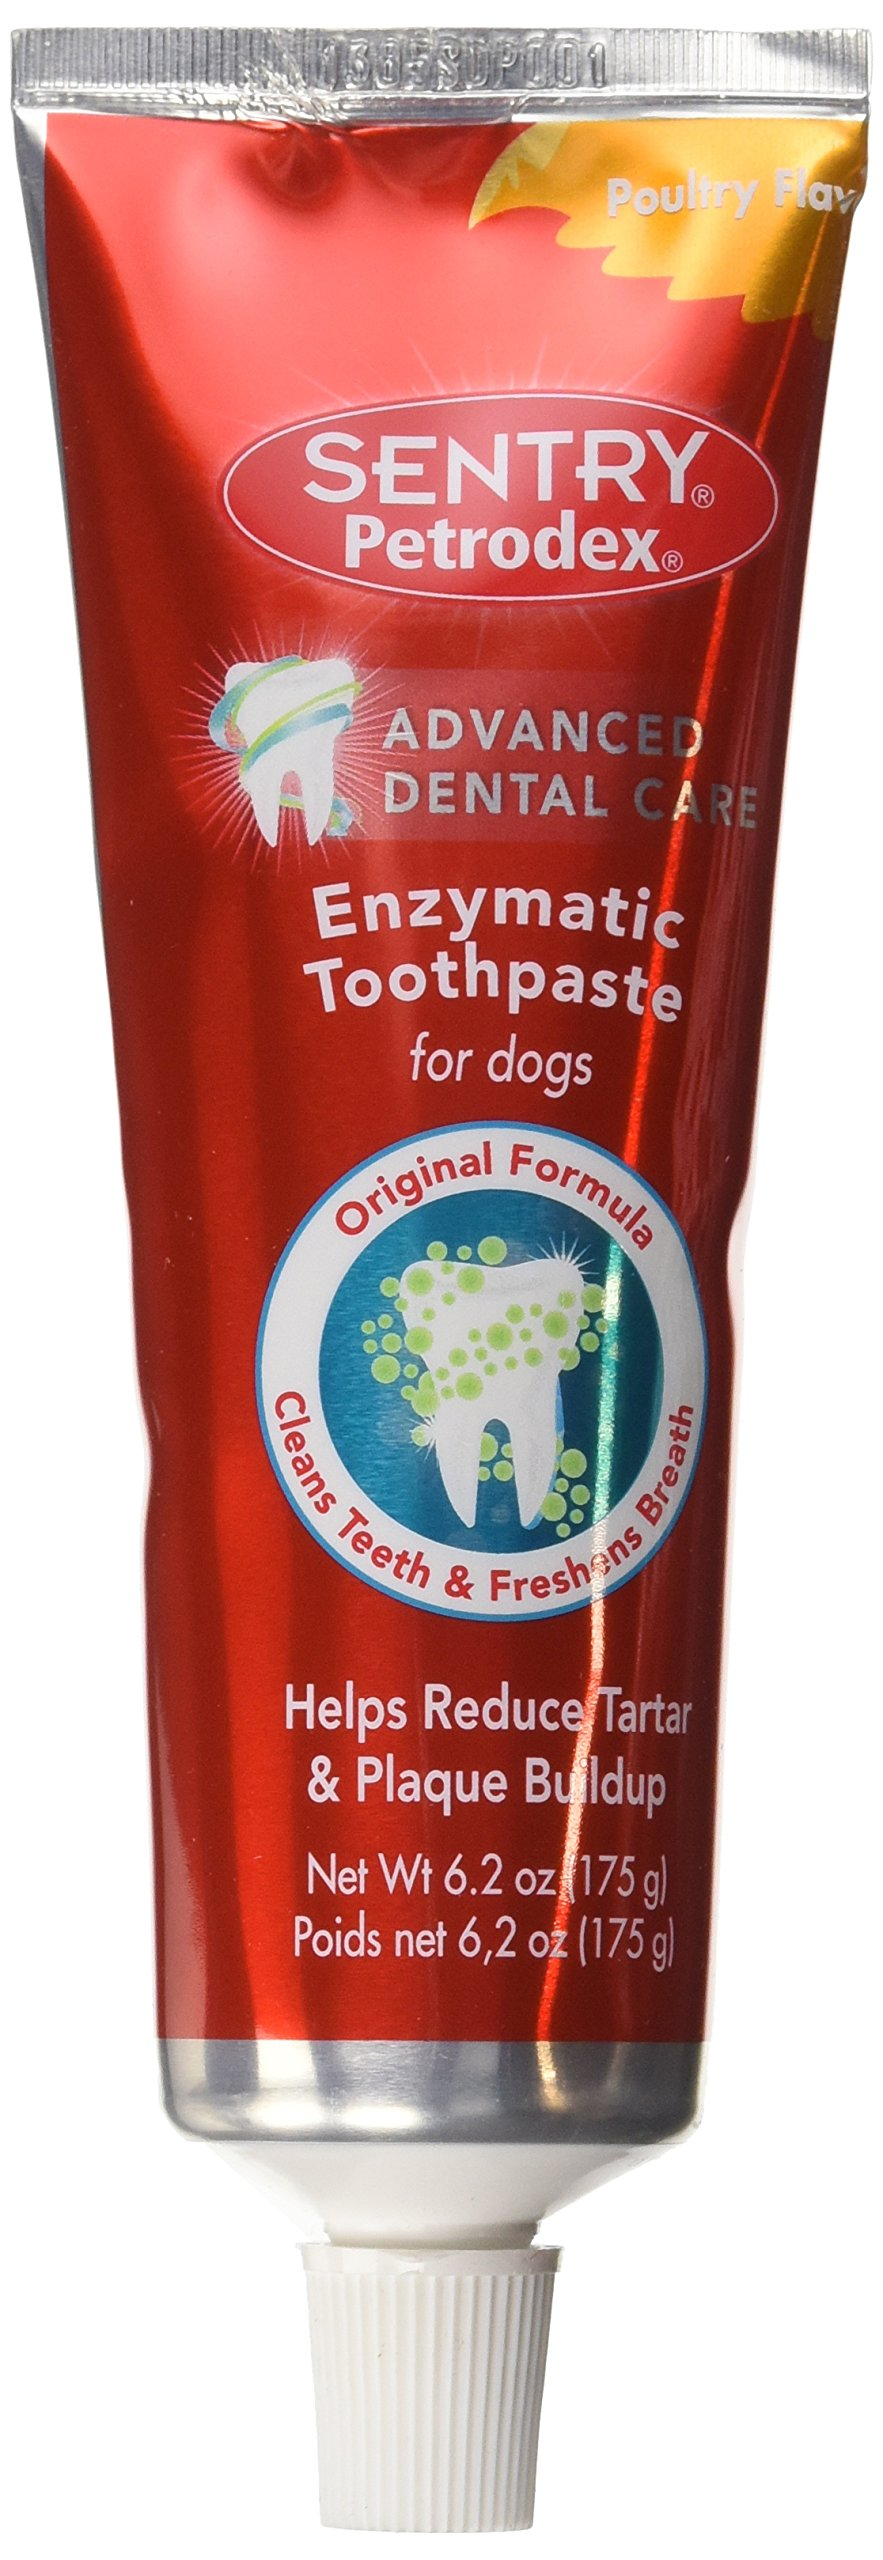 Petrodex Enzymatic Toothpaste Dog Poultry Flavor, 6.2 oz